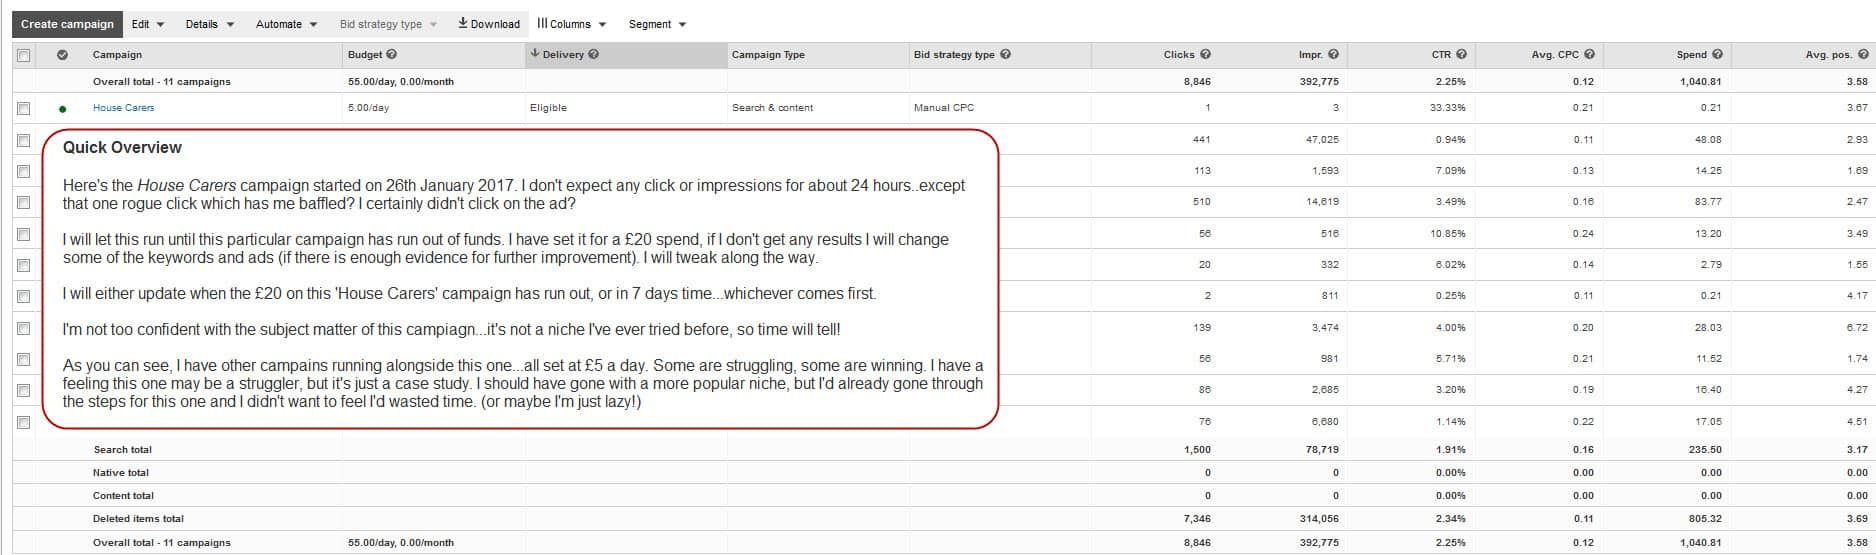 bingads v clickbank overview